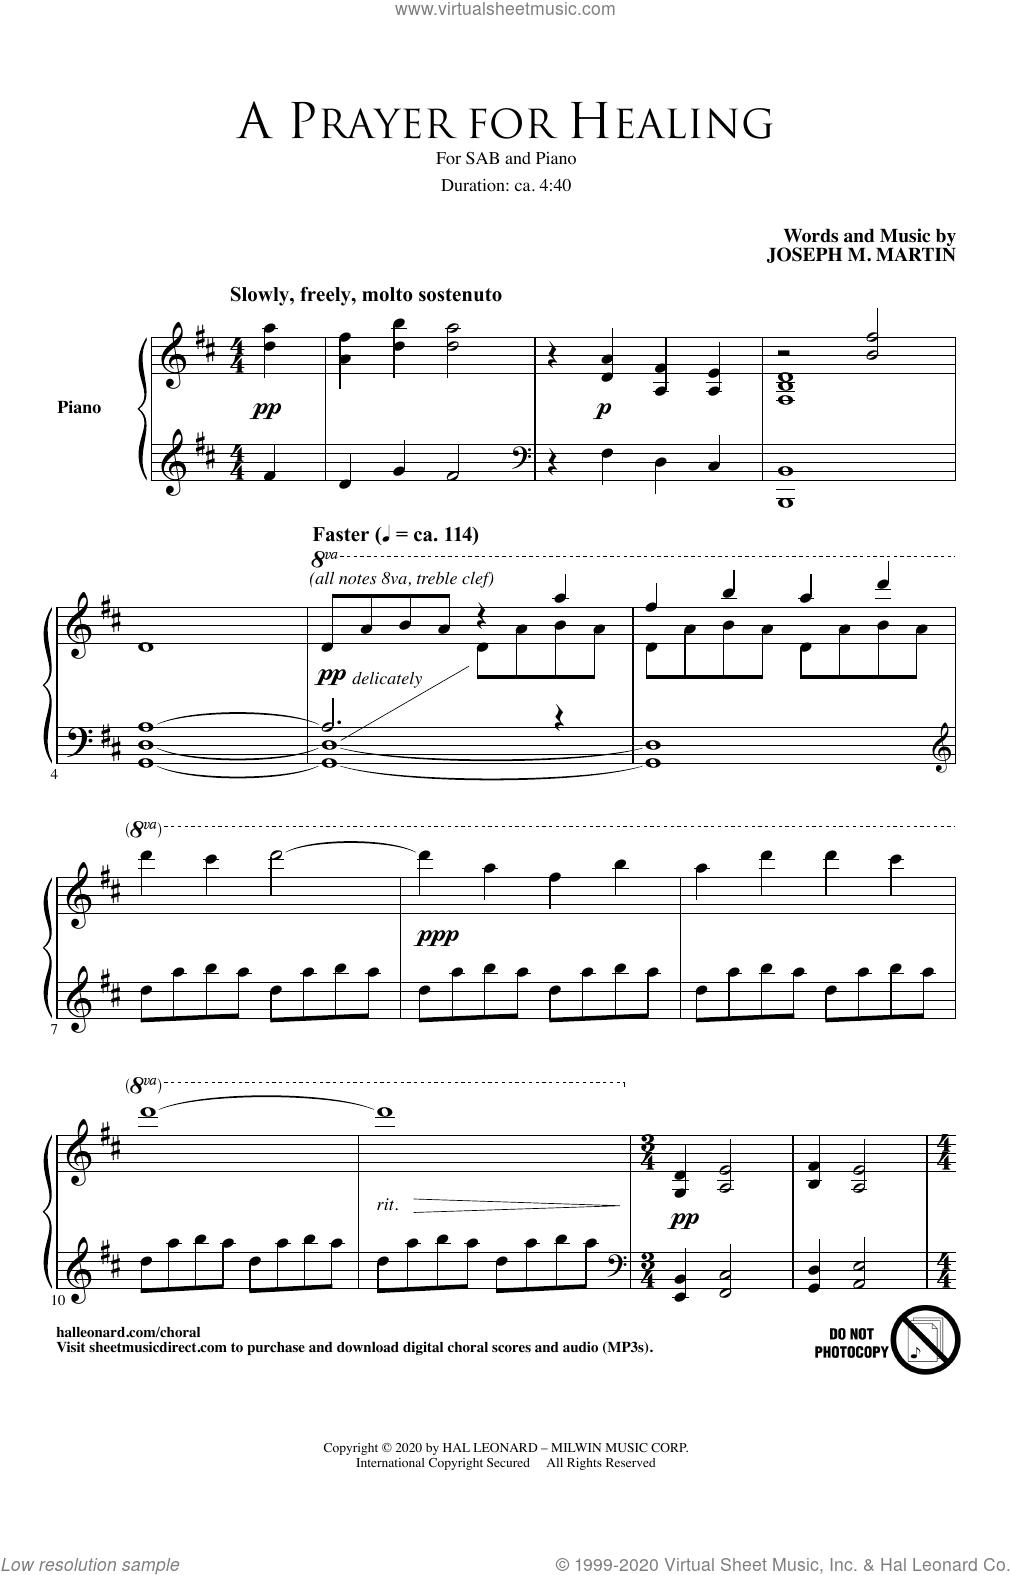 A Prayer For Healing sheet music for choir (SAB: soprano, alto, bass) by Joseph M. Martin, intermediate skill level